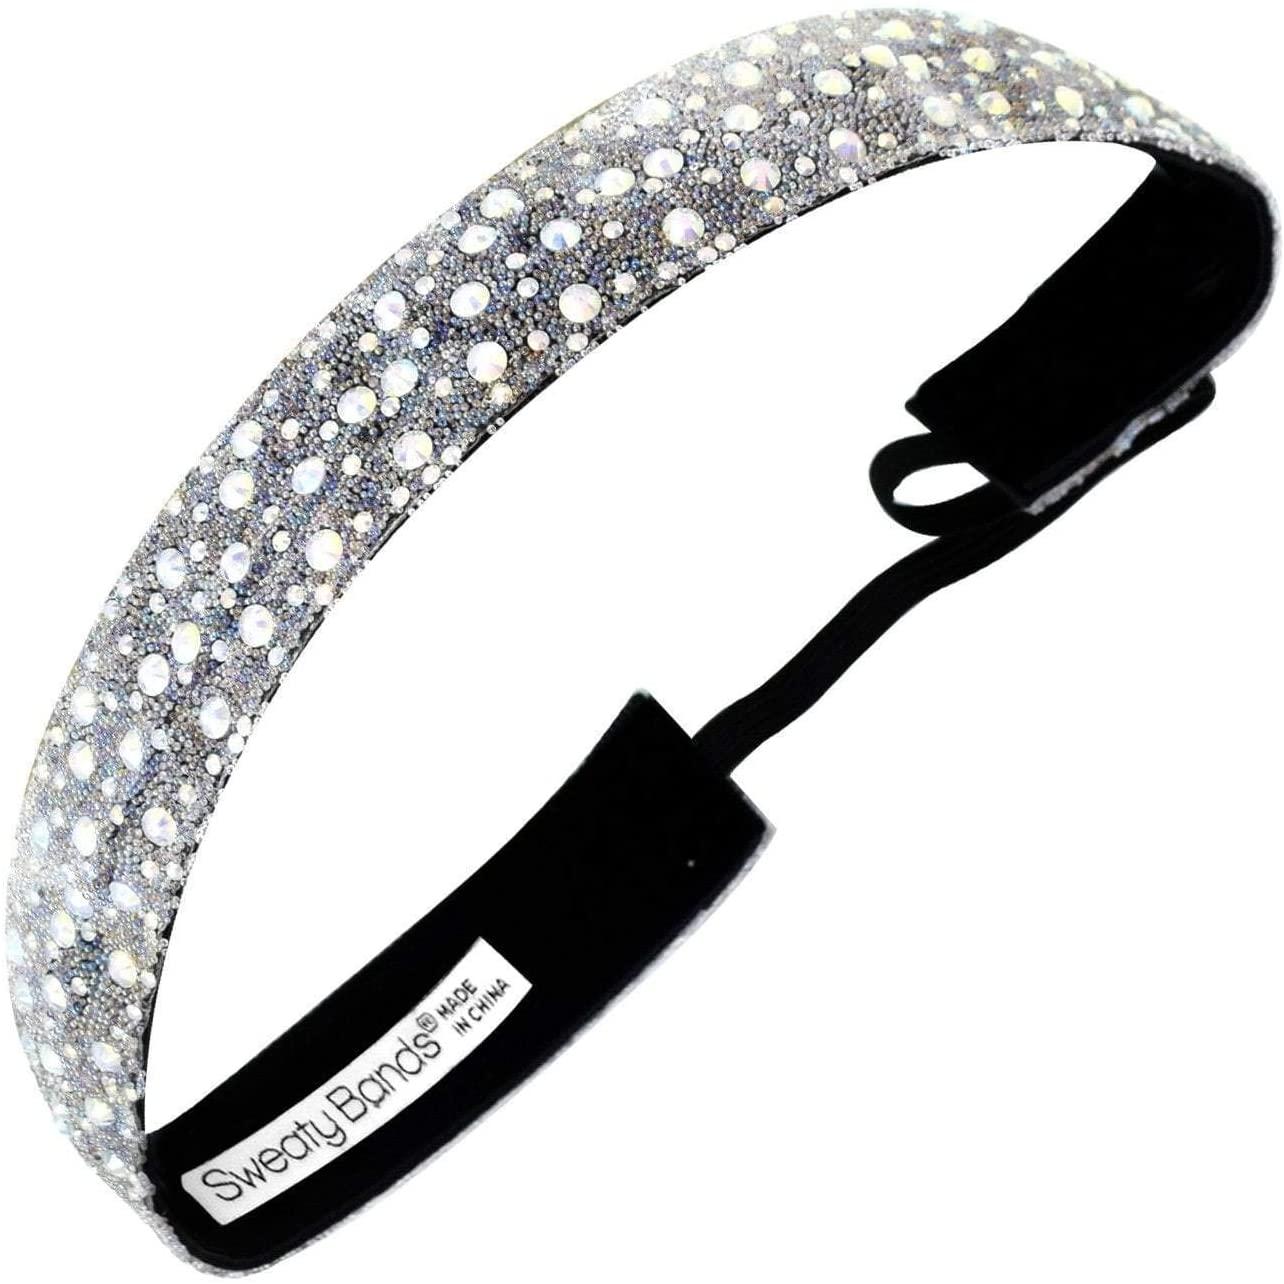 Sweaty Bands Womens Girls Headband - Non-Slip, Velvet-Lined Sparkly Hairband - Bling It Date Night Iridescent 7/8-Inch